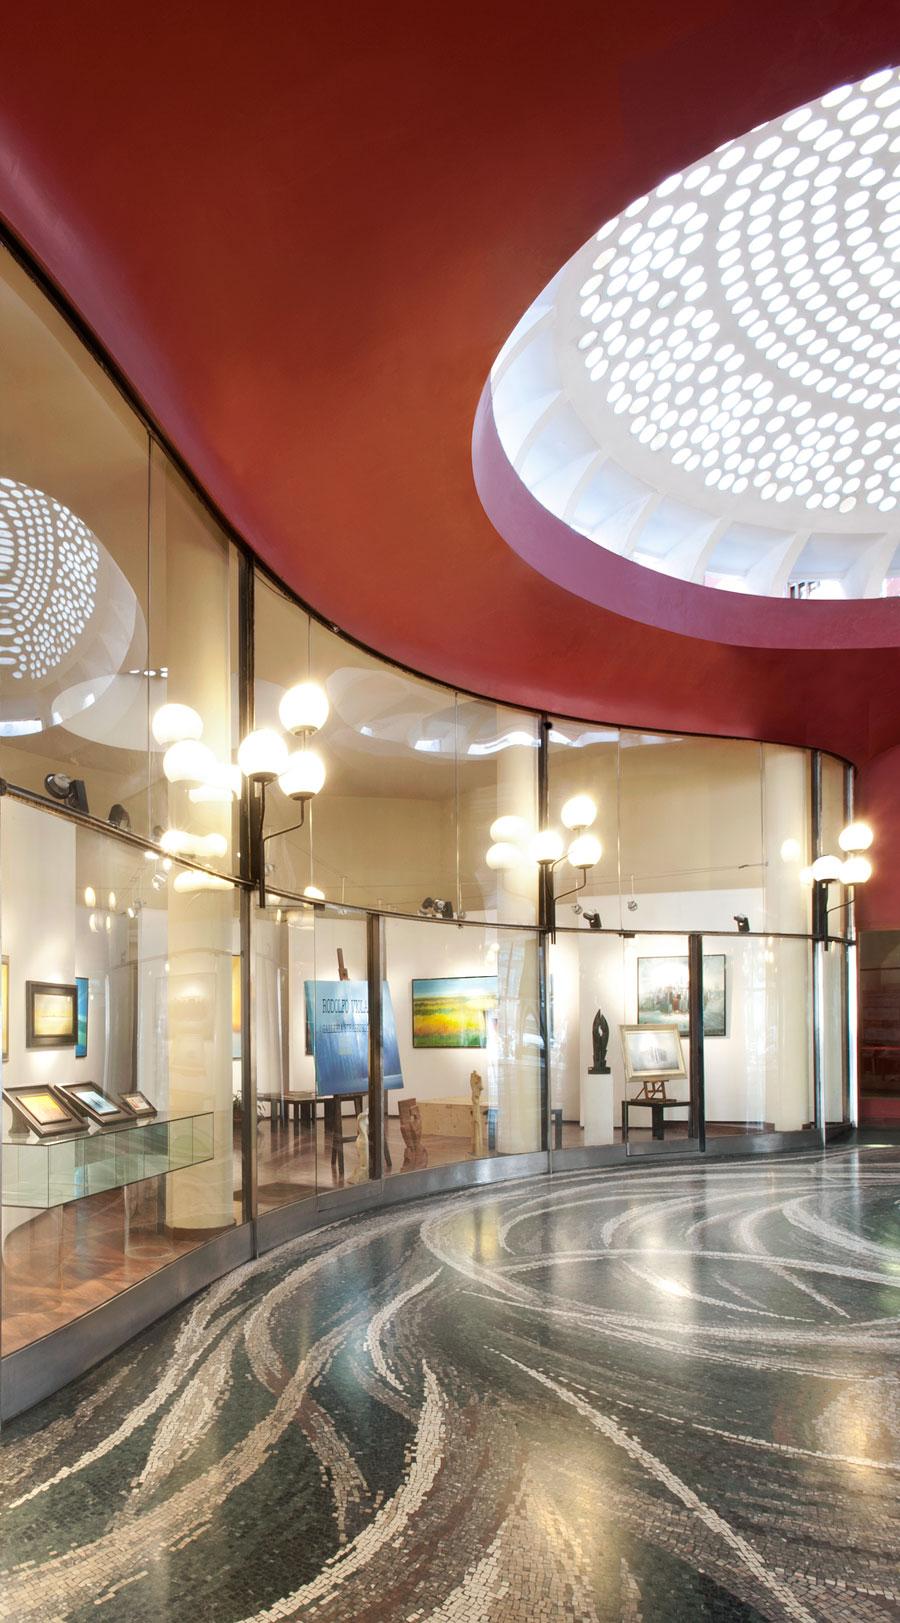 Galleria Strasburgo from Via Durini